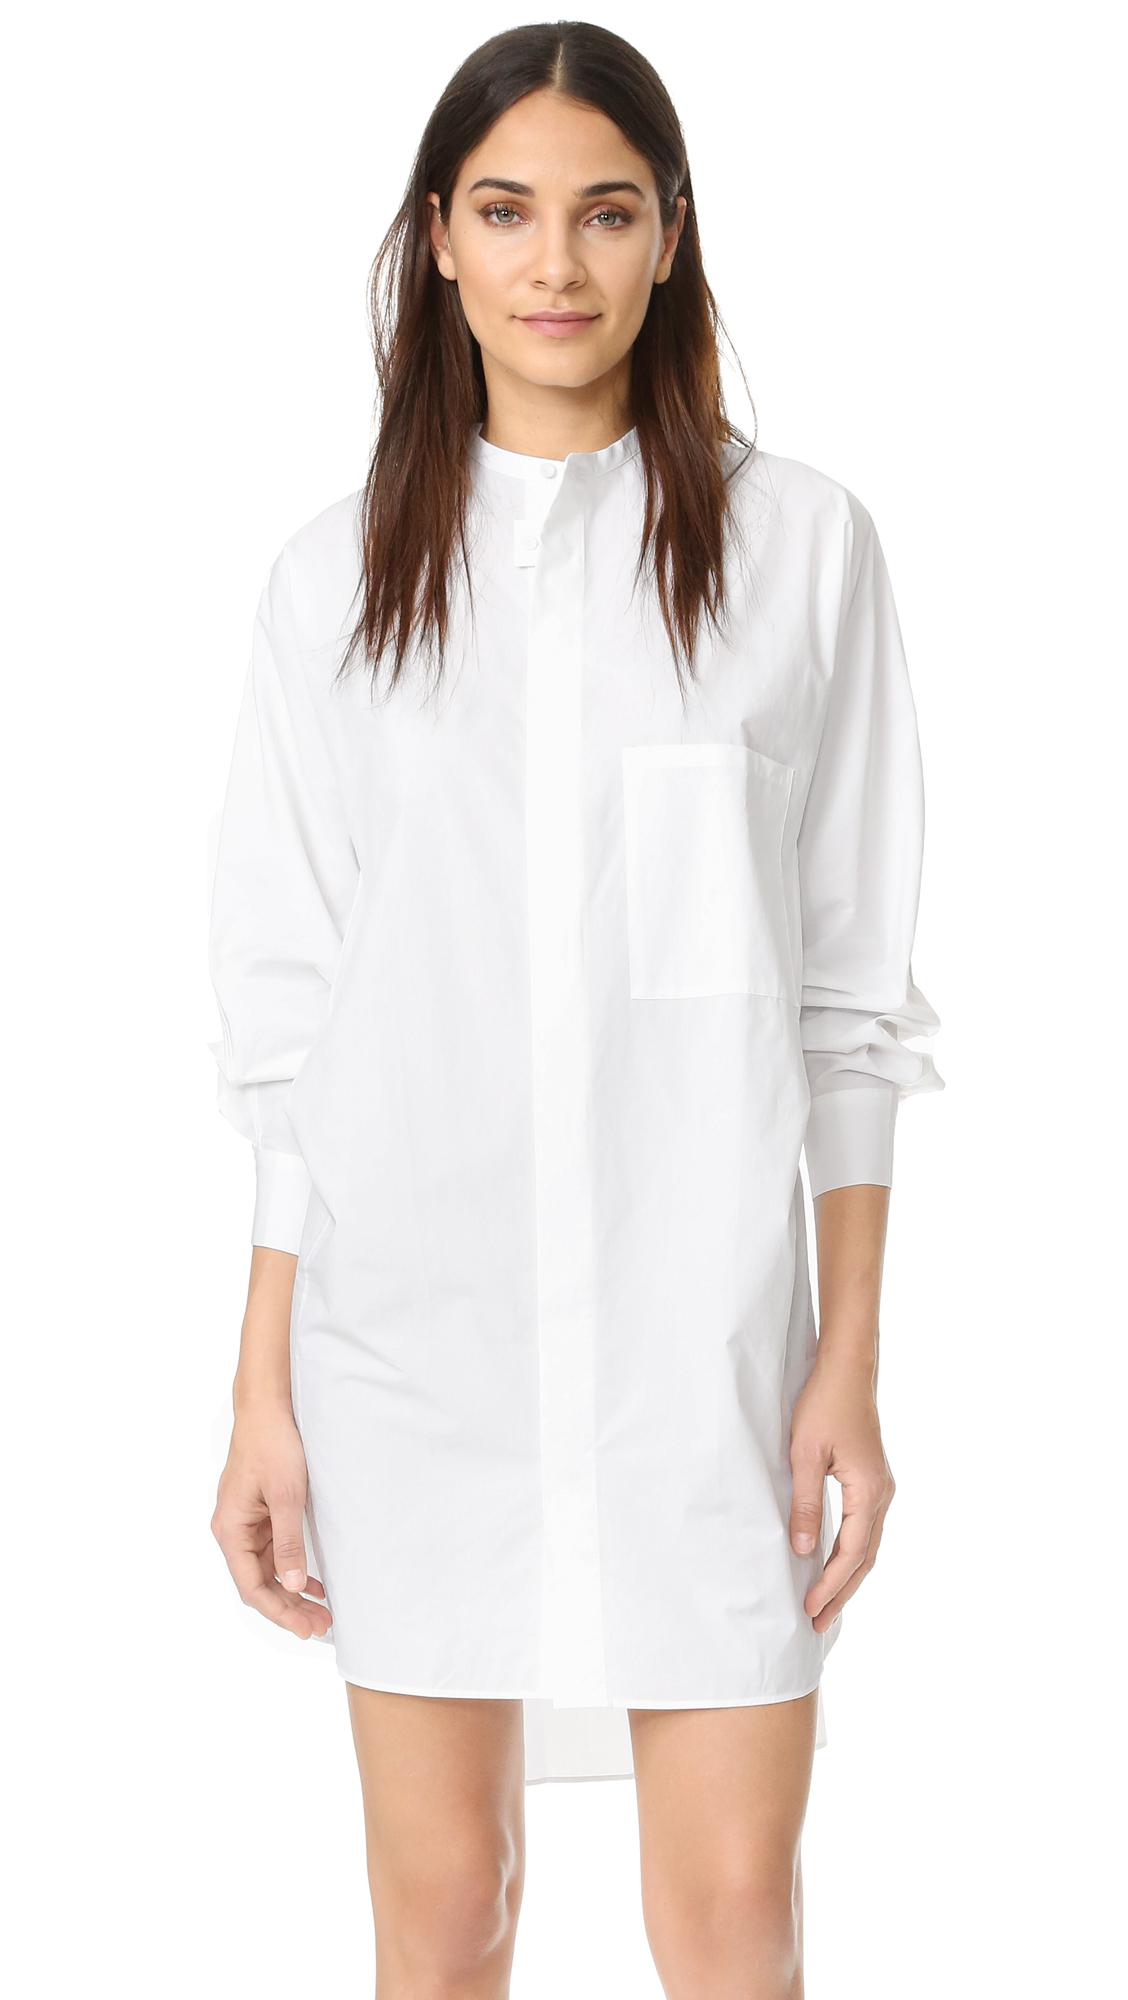 Acne Studios Siva Soft Poplin Dress - White at Shopbop